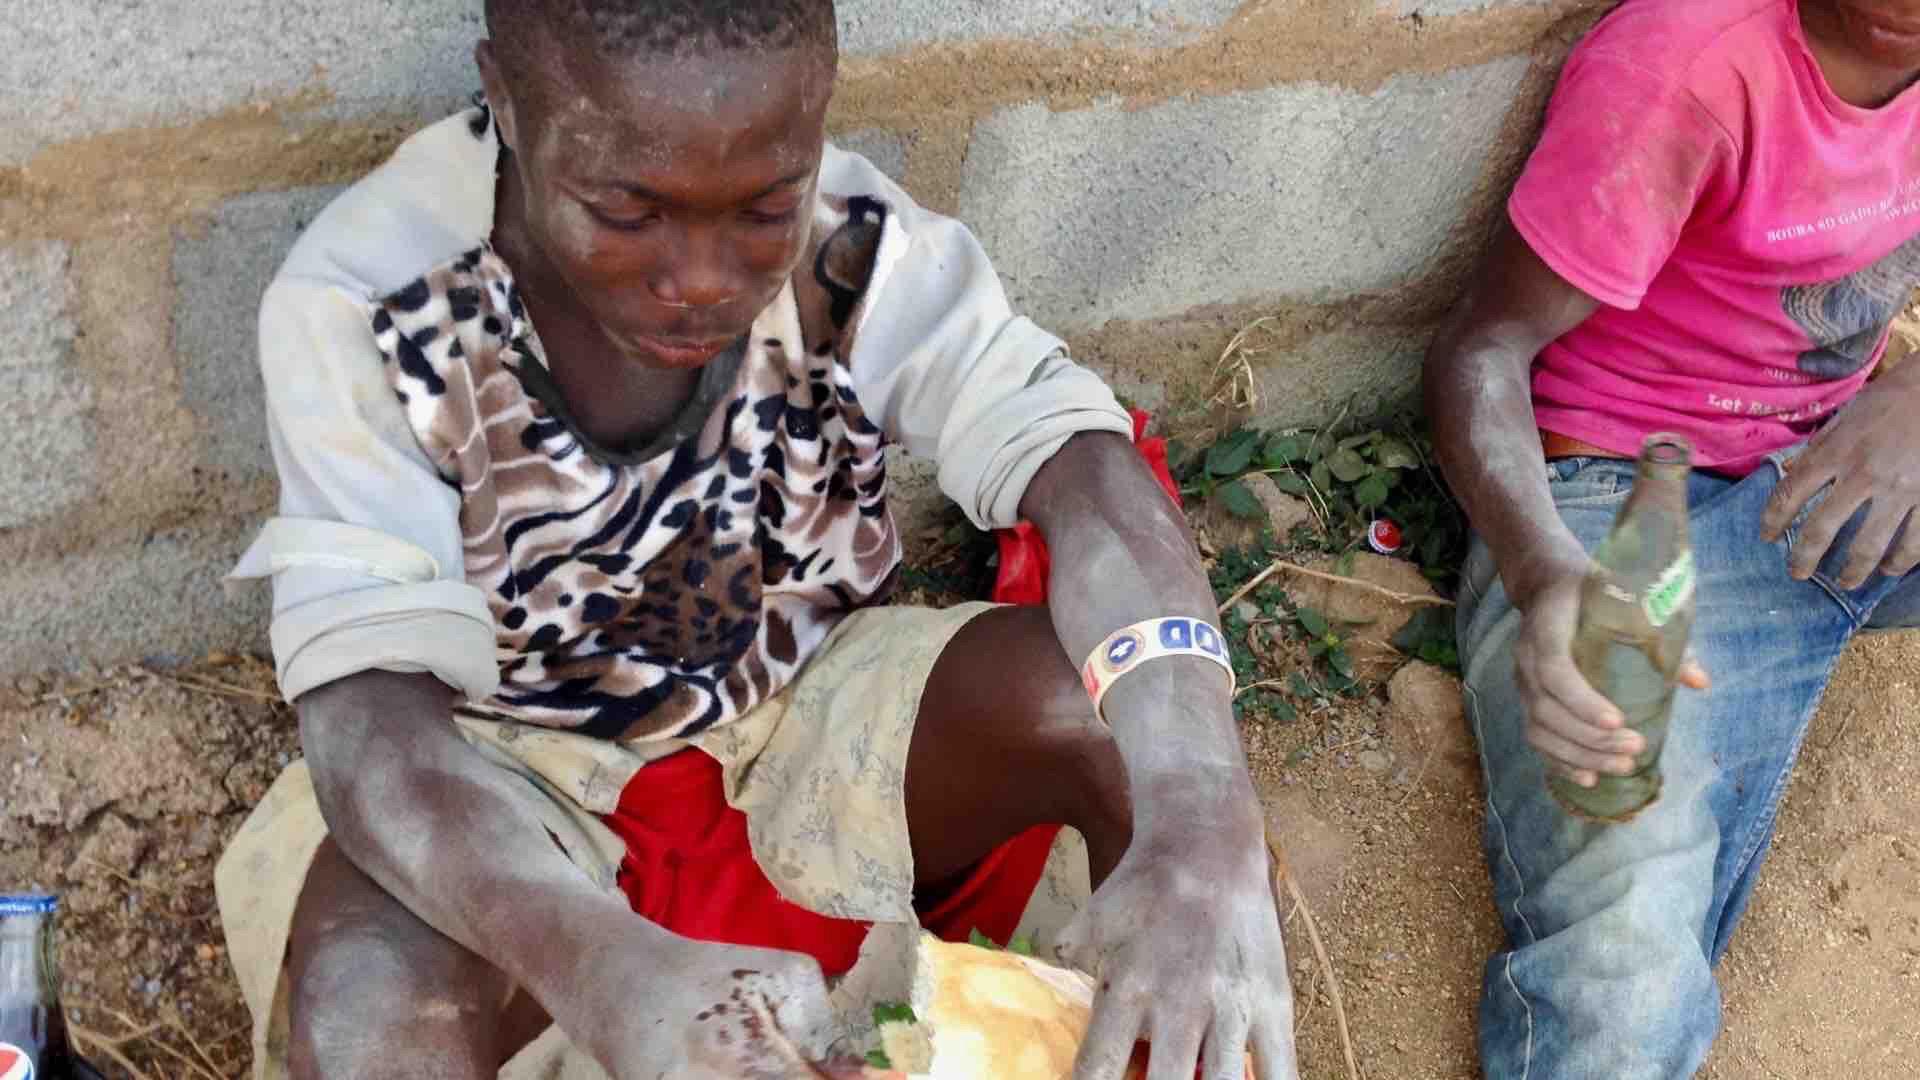 Kehinde 16, day laborer in Ushafa Nigeria. #JujuFilms